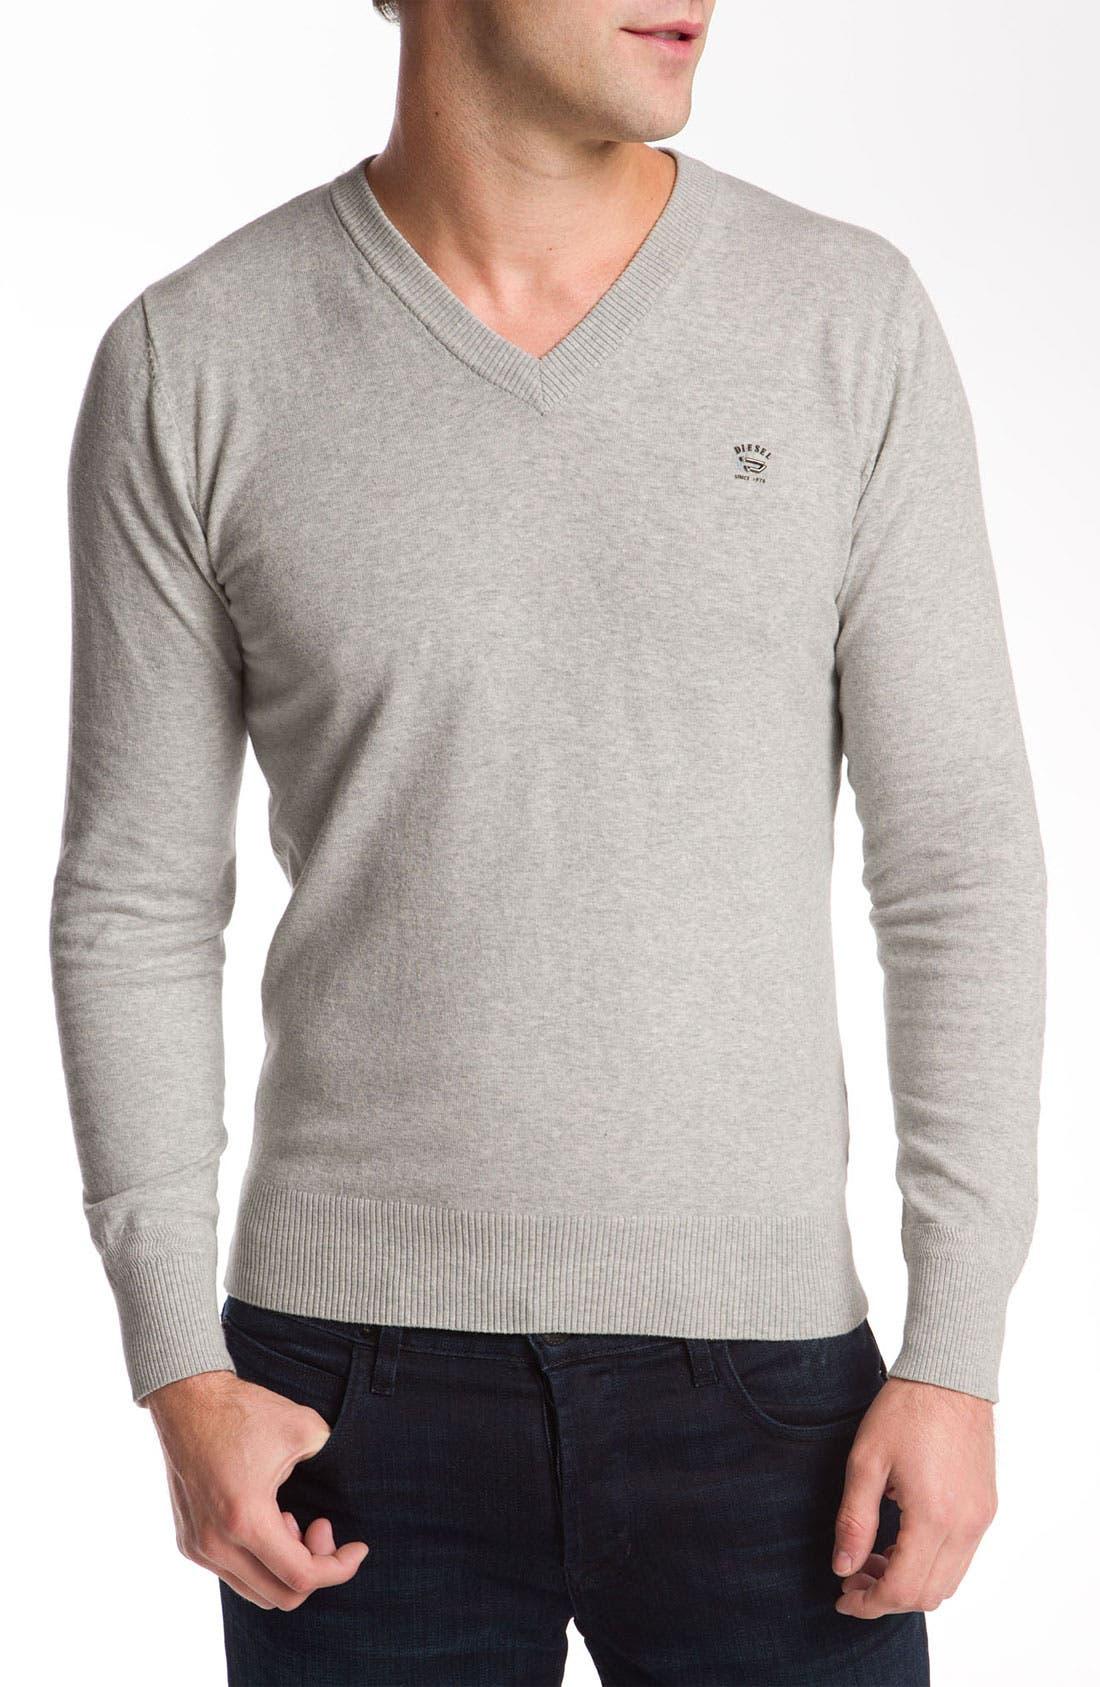 Main Image - DIESEL® 'K-Meceneo' V-Neck Sweater